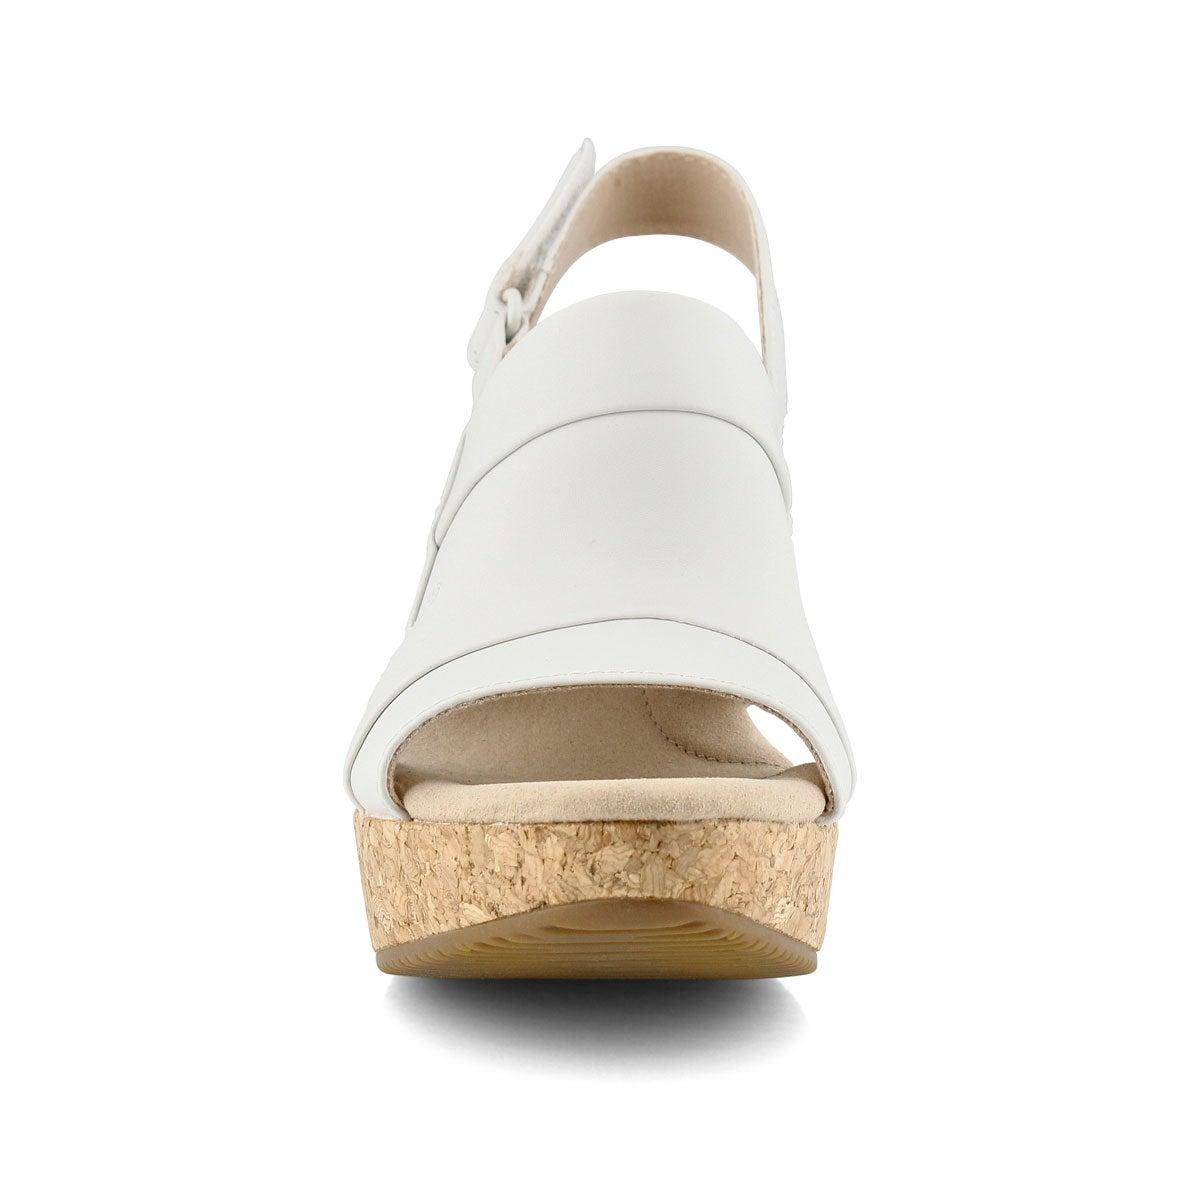 Sand.Annadel Ivory,talon comp., blc, fem